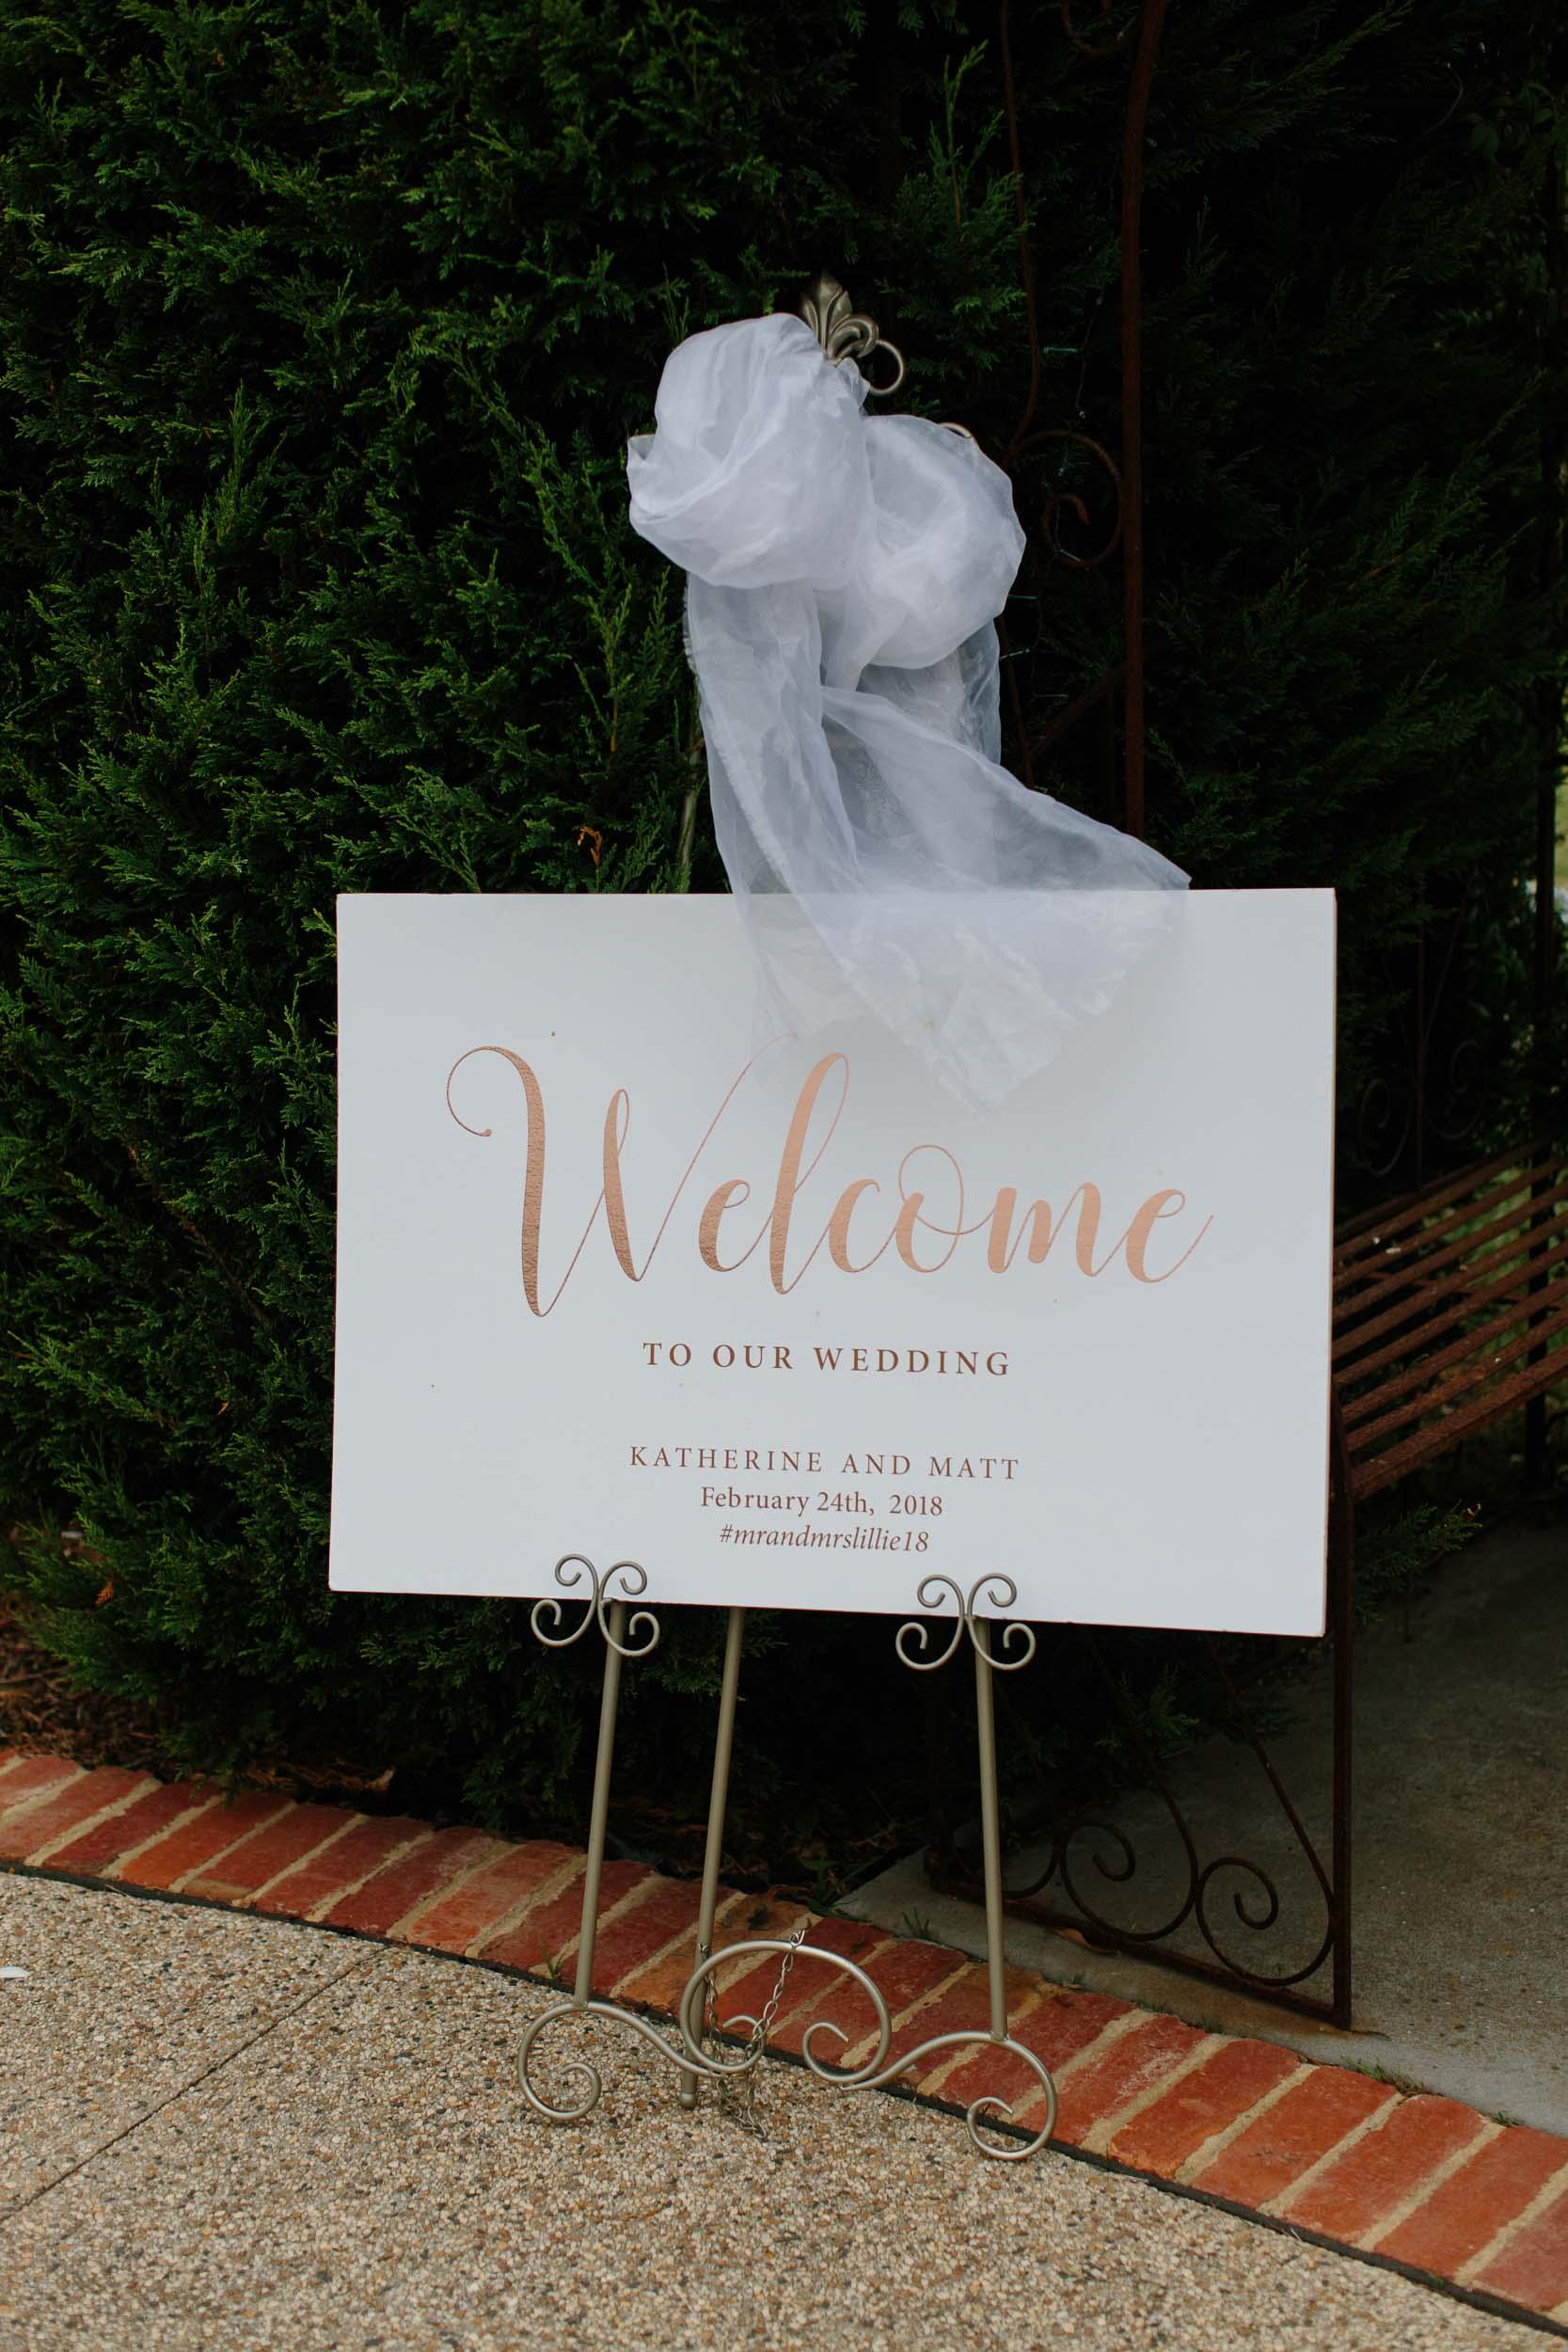 Kas-Richards-Mornington-Peninsula-Private-Property-Wedding-Marianna-Hardwick-Gown-525.jpg